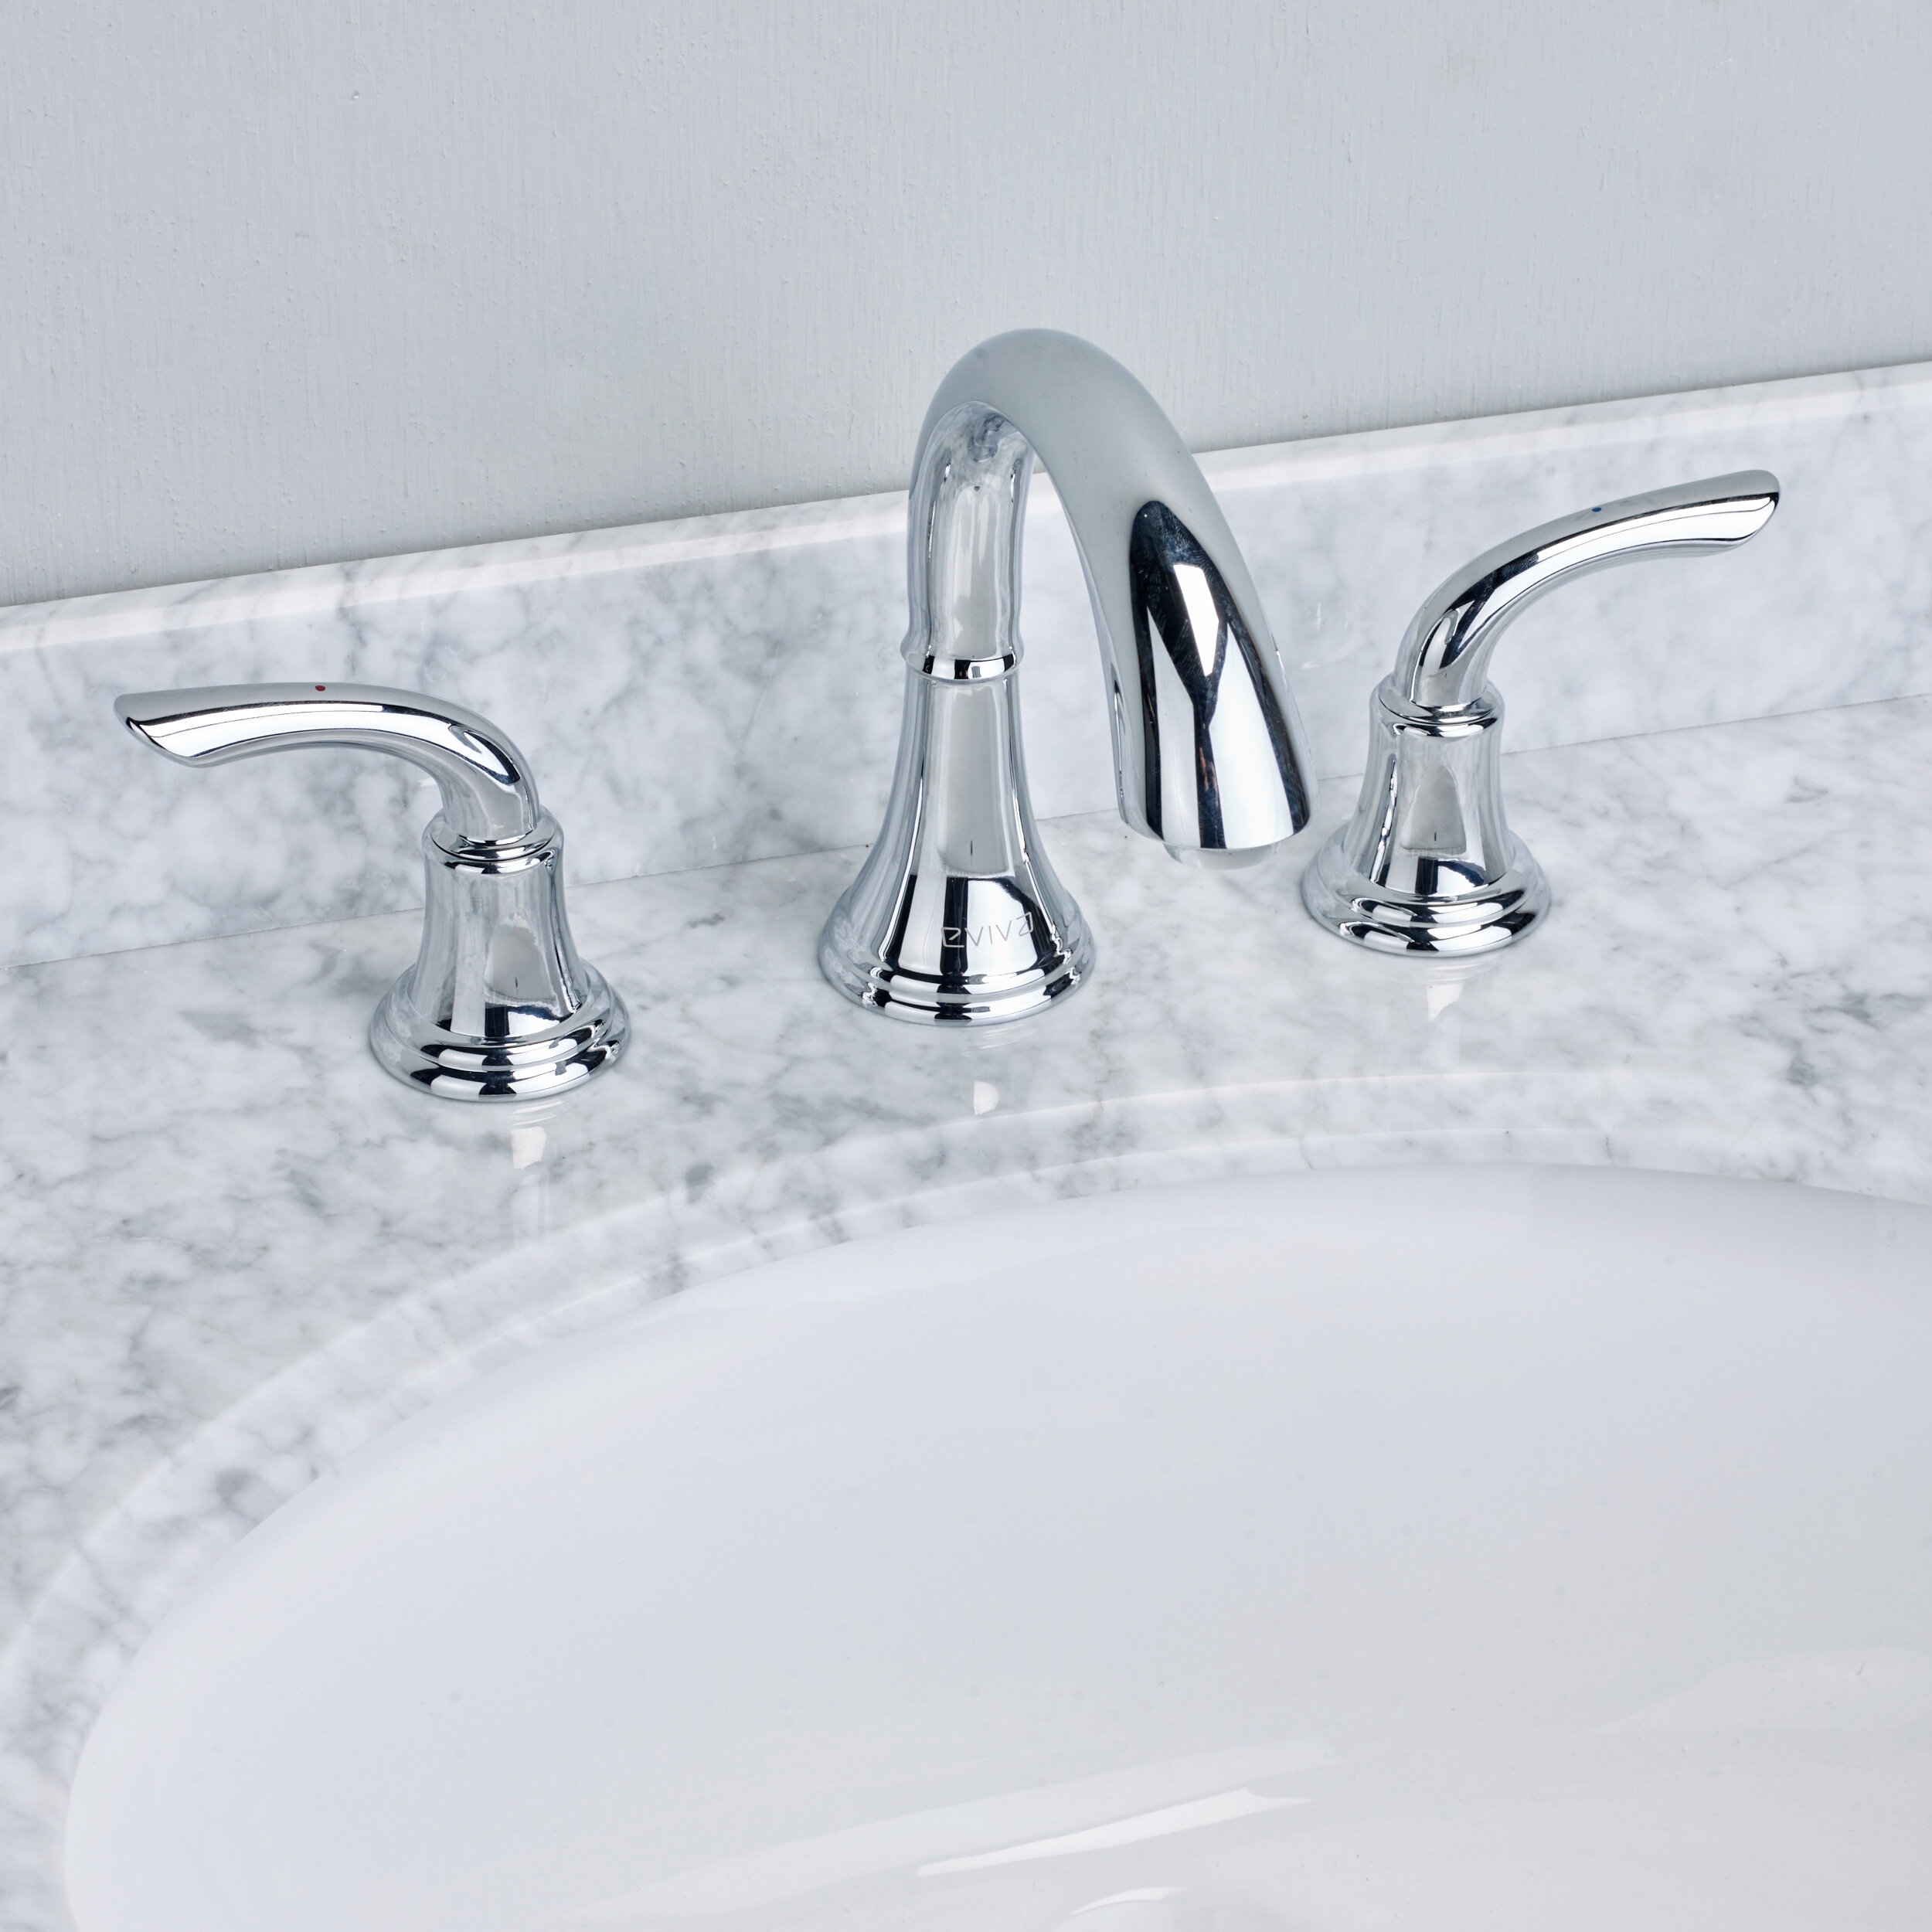 Eviva Friendy® Deck Mount Widespread Bathroom Faucet | Wayfair